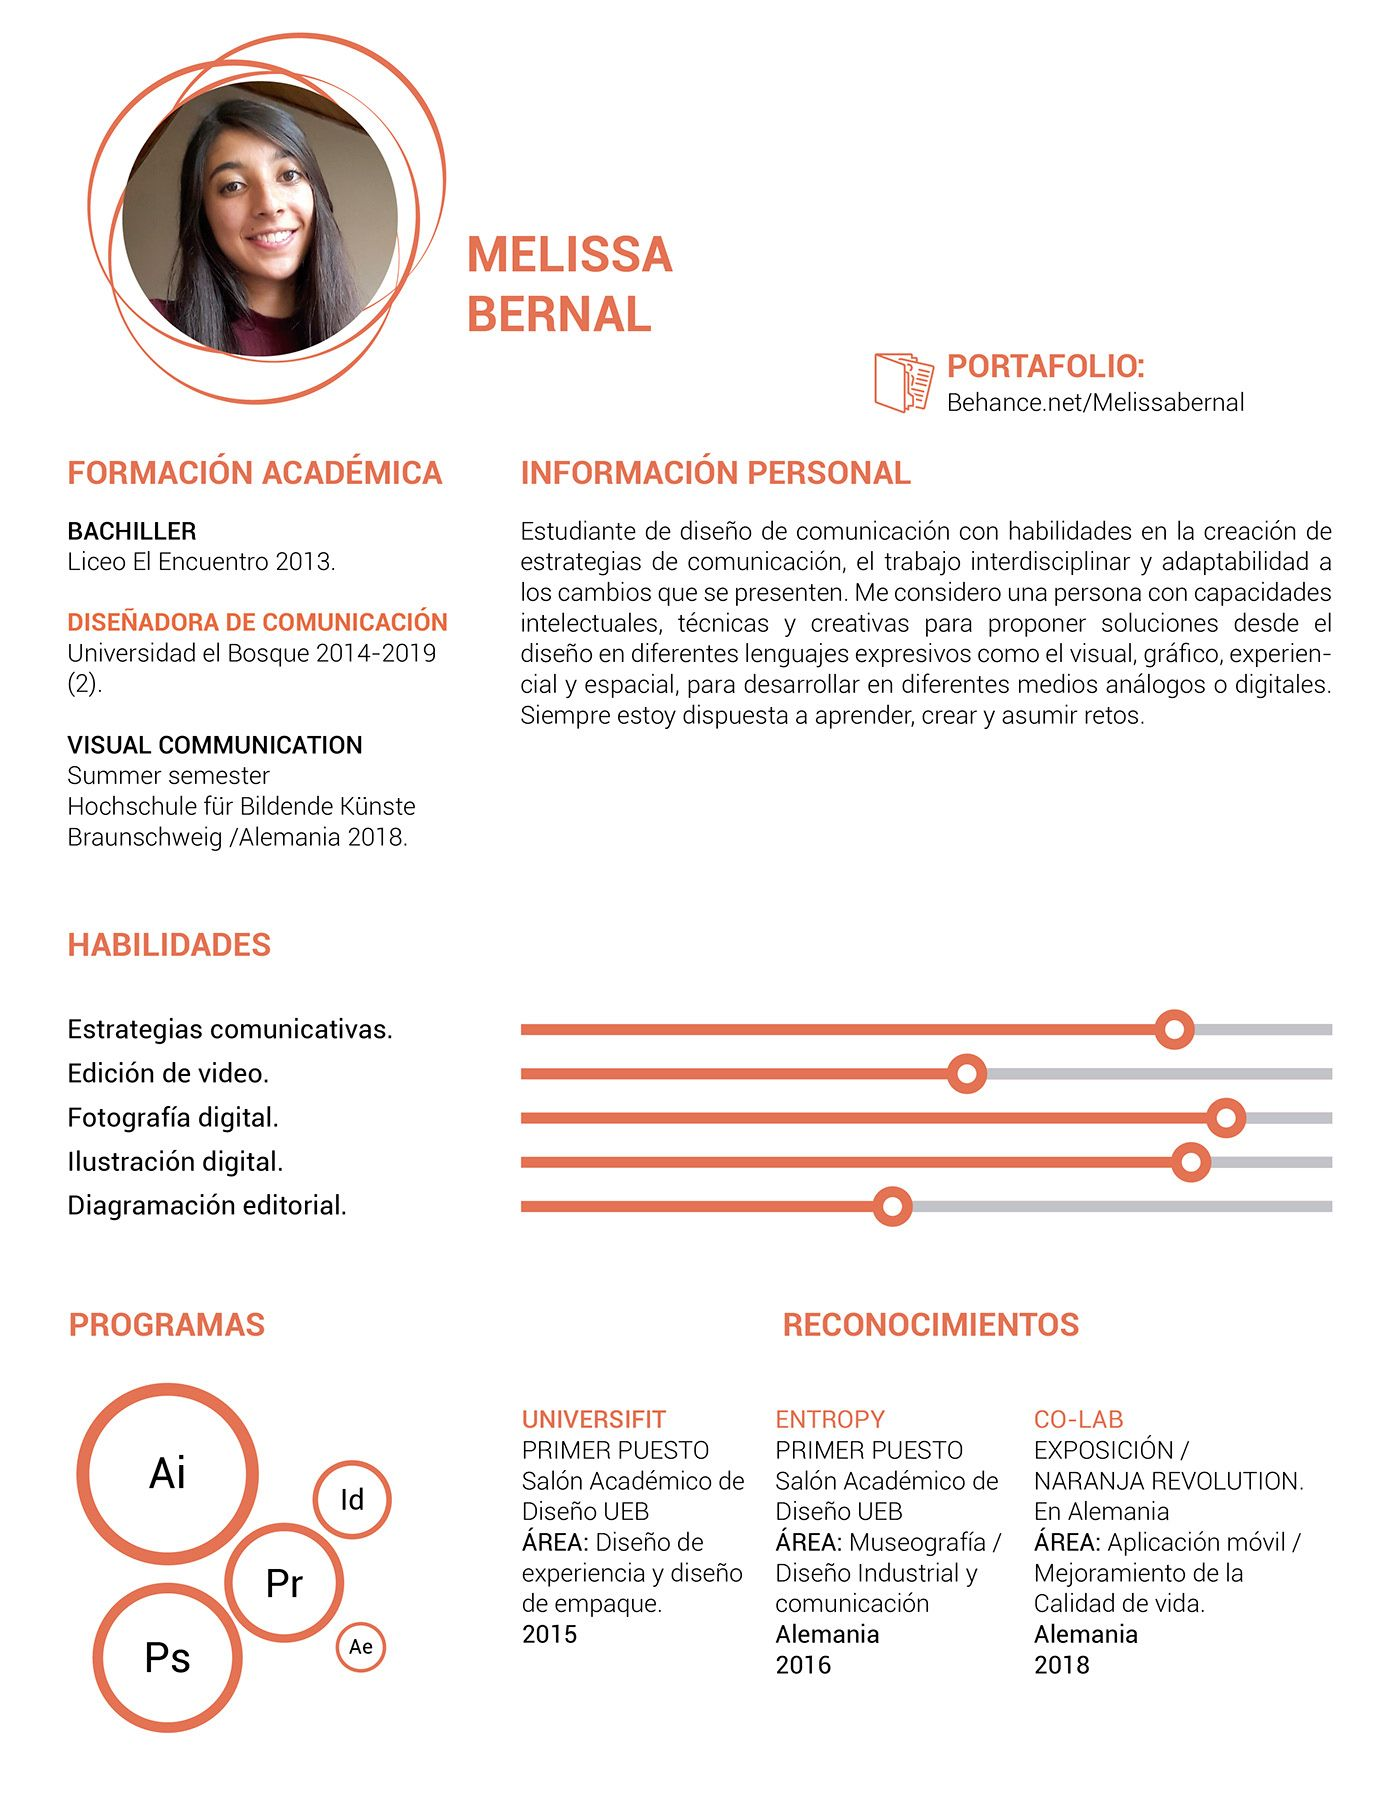 Infographic CV / Resume in 2020 Creative resume, Graphic